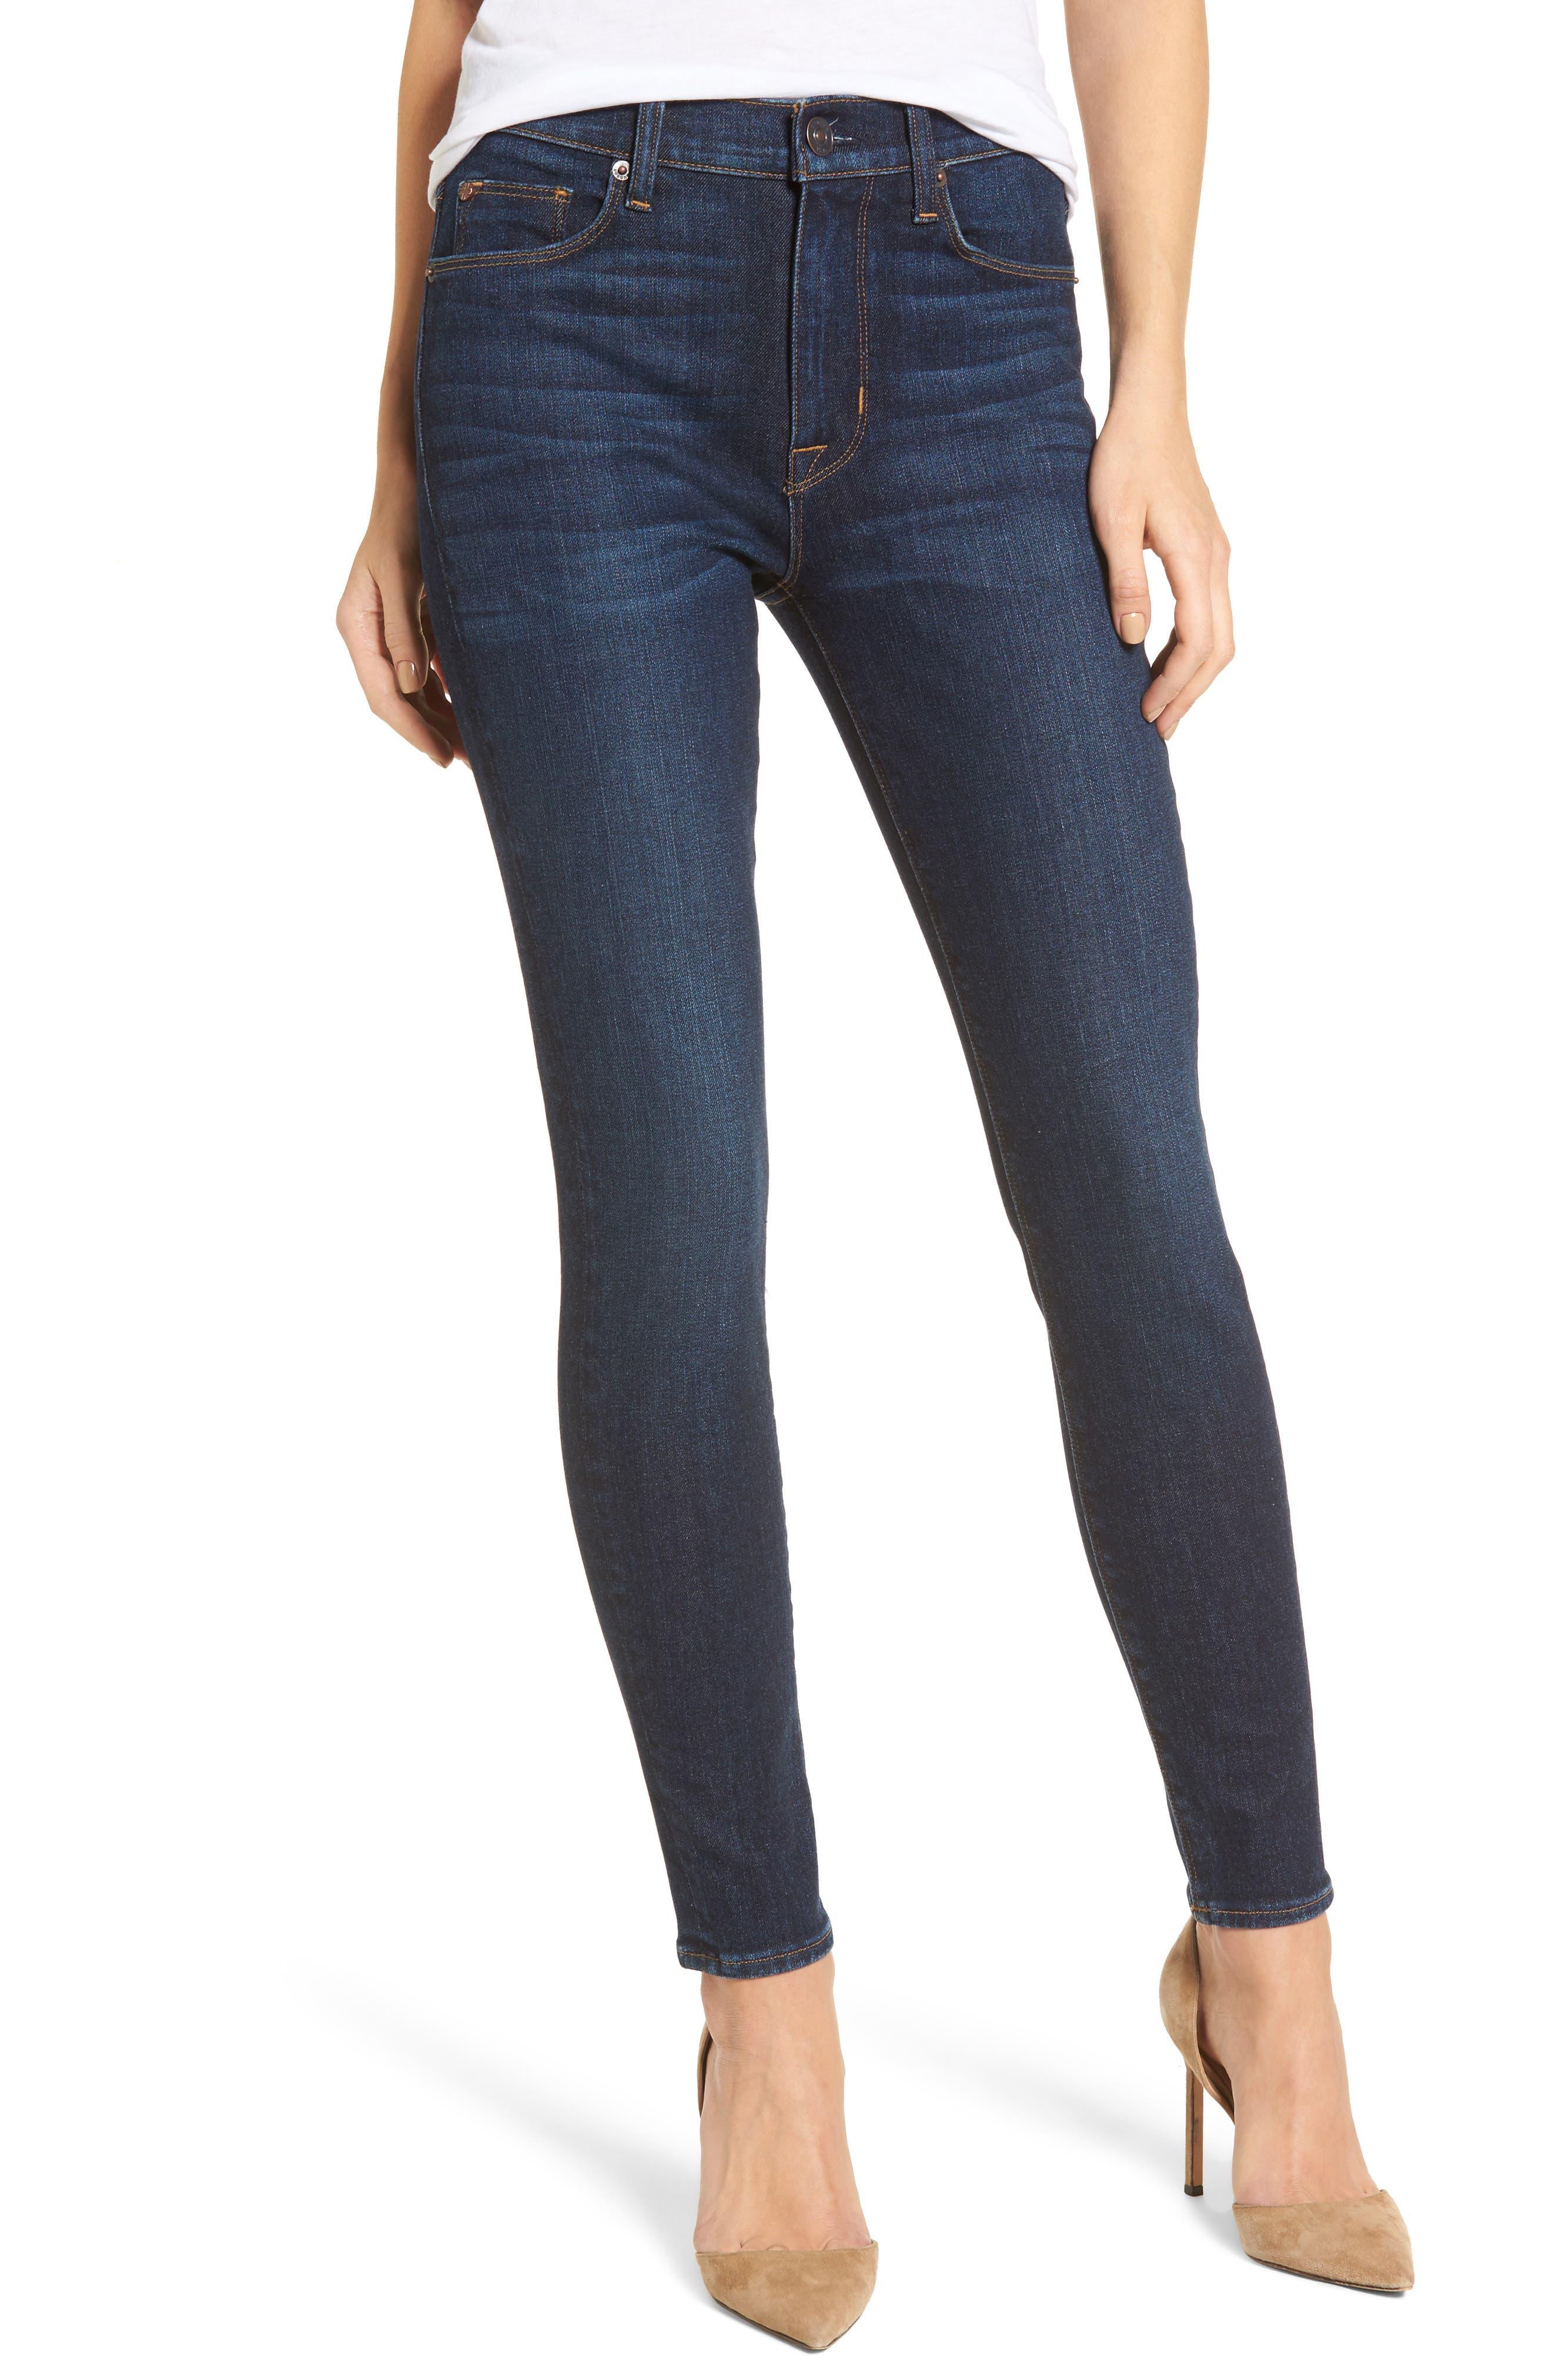 Main Image - Hudson Jeans Barbara High Waist Ankle Super Skinny Jeans (Daze)